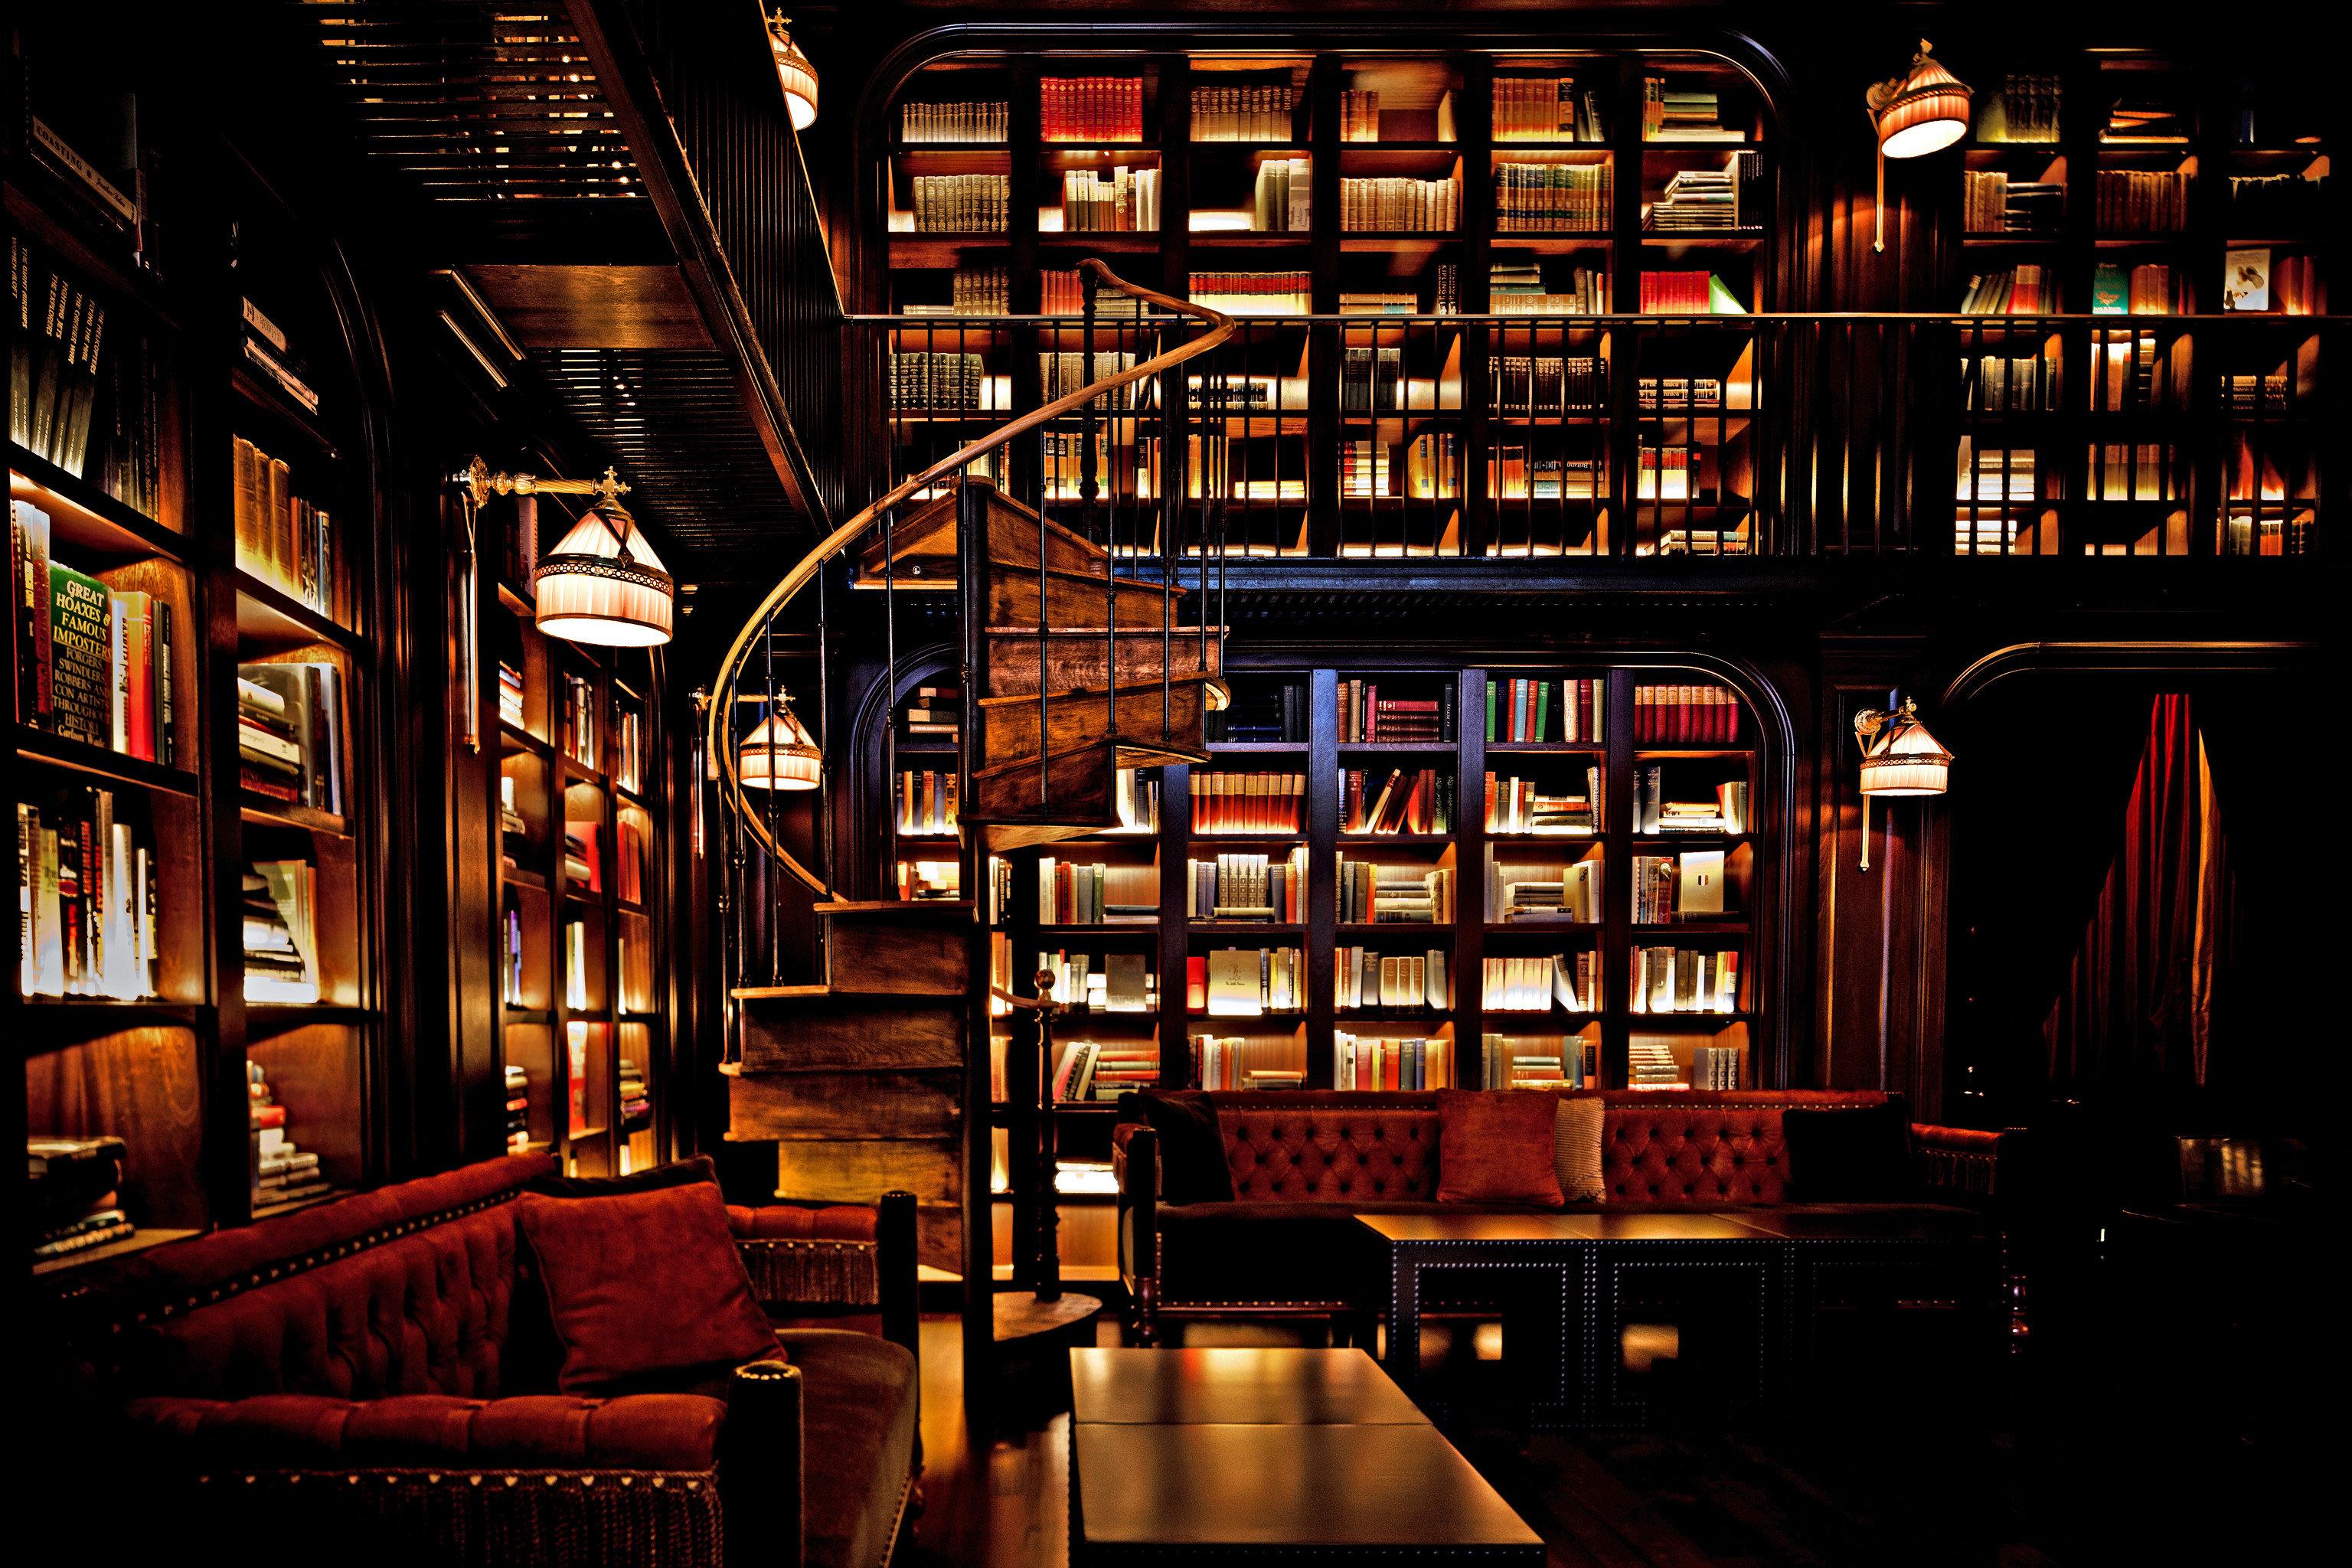 City Hip Hotels Luxury Luxury Travel NYC Romantic Hotels indoor building Bar interior design